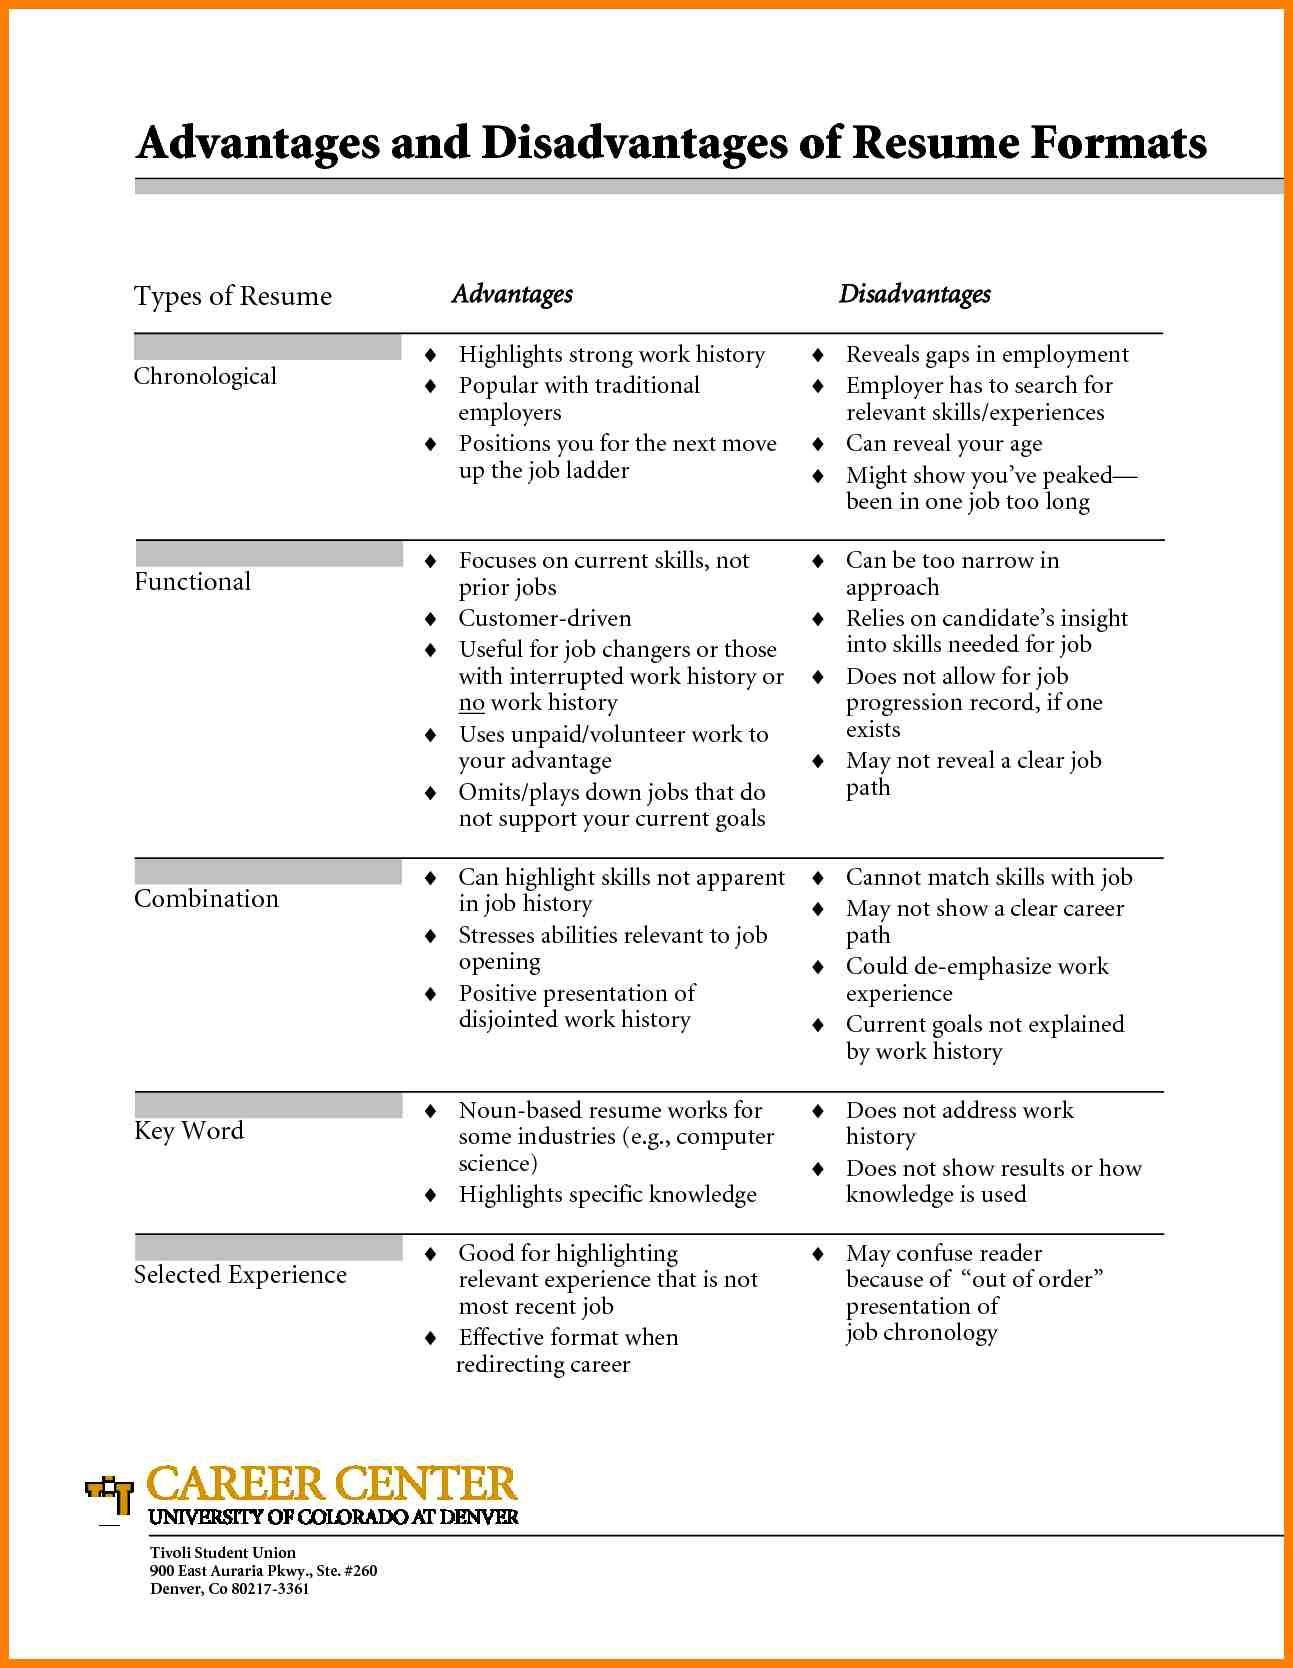 Resume Format Types